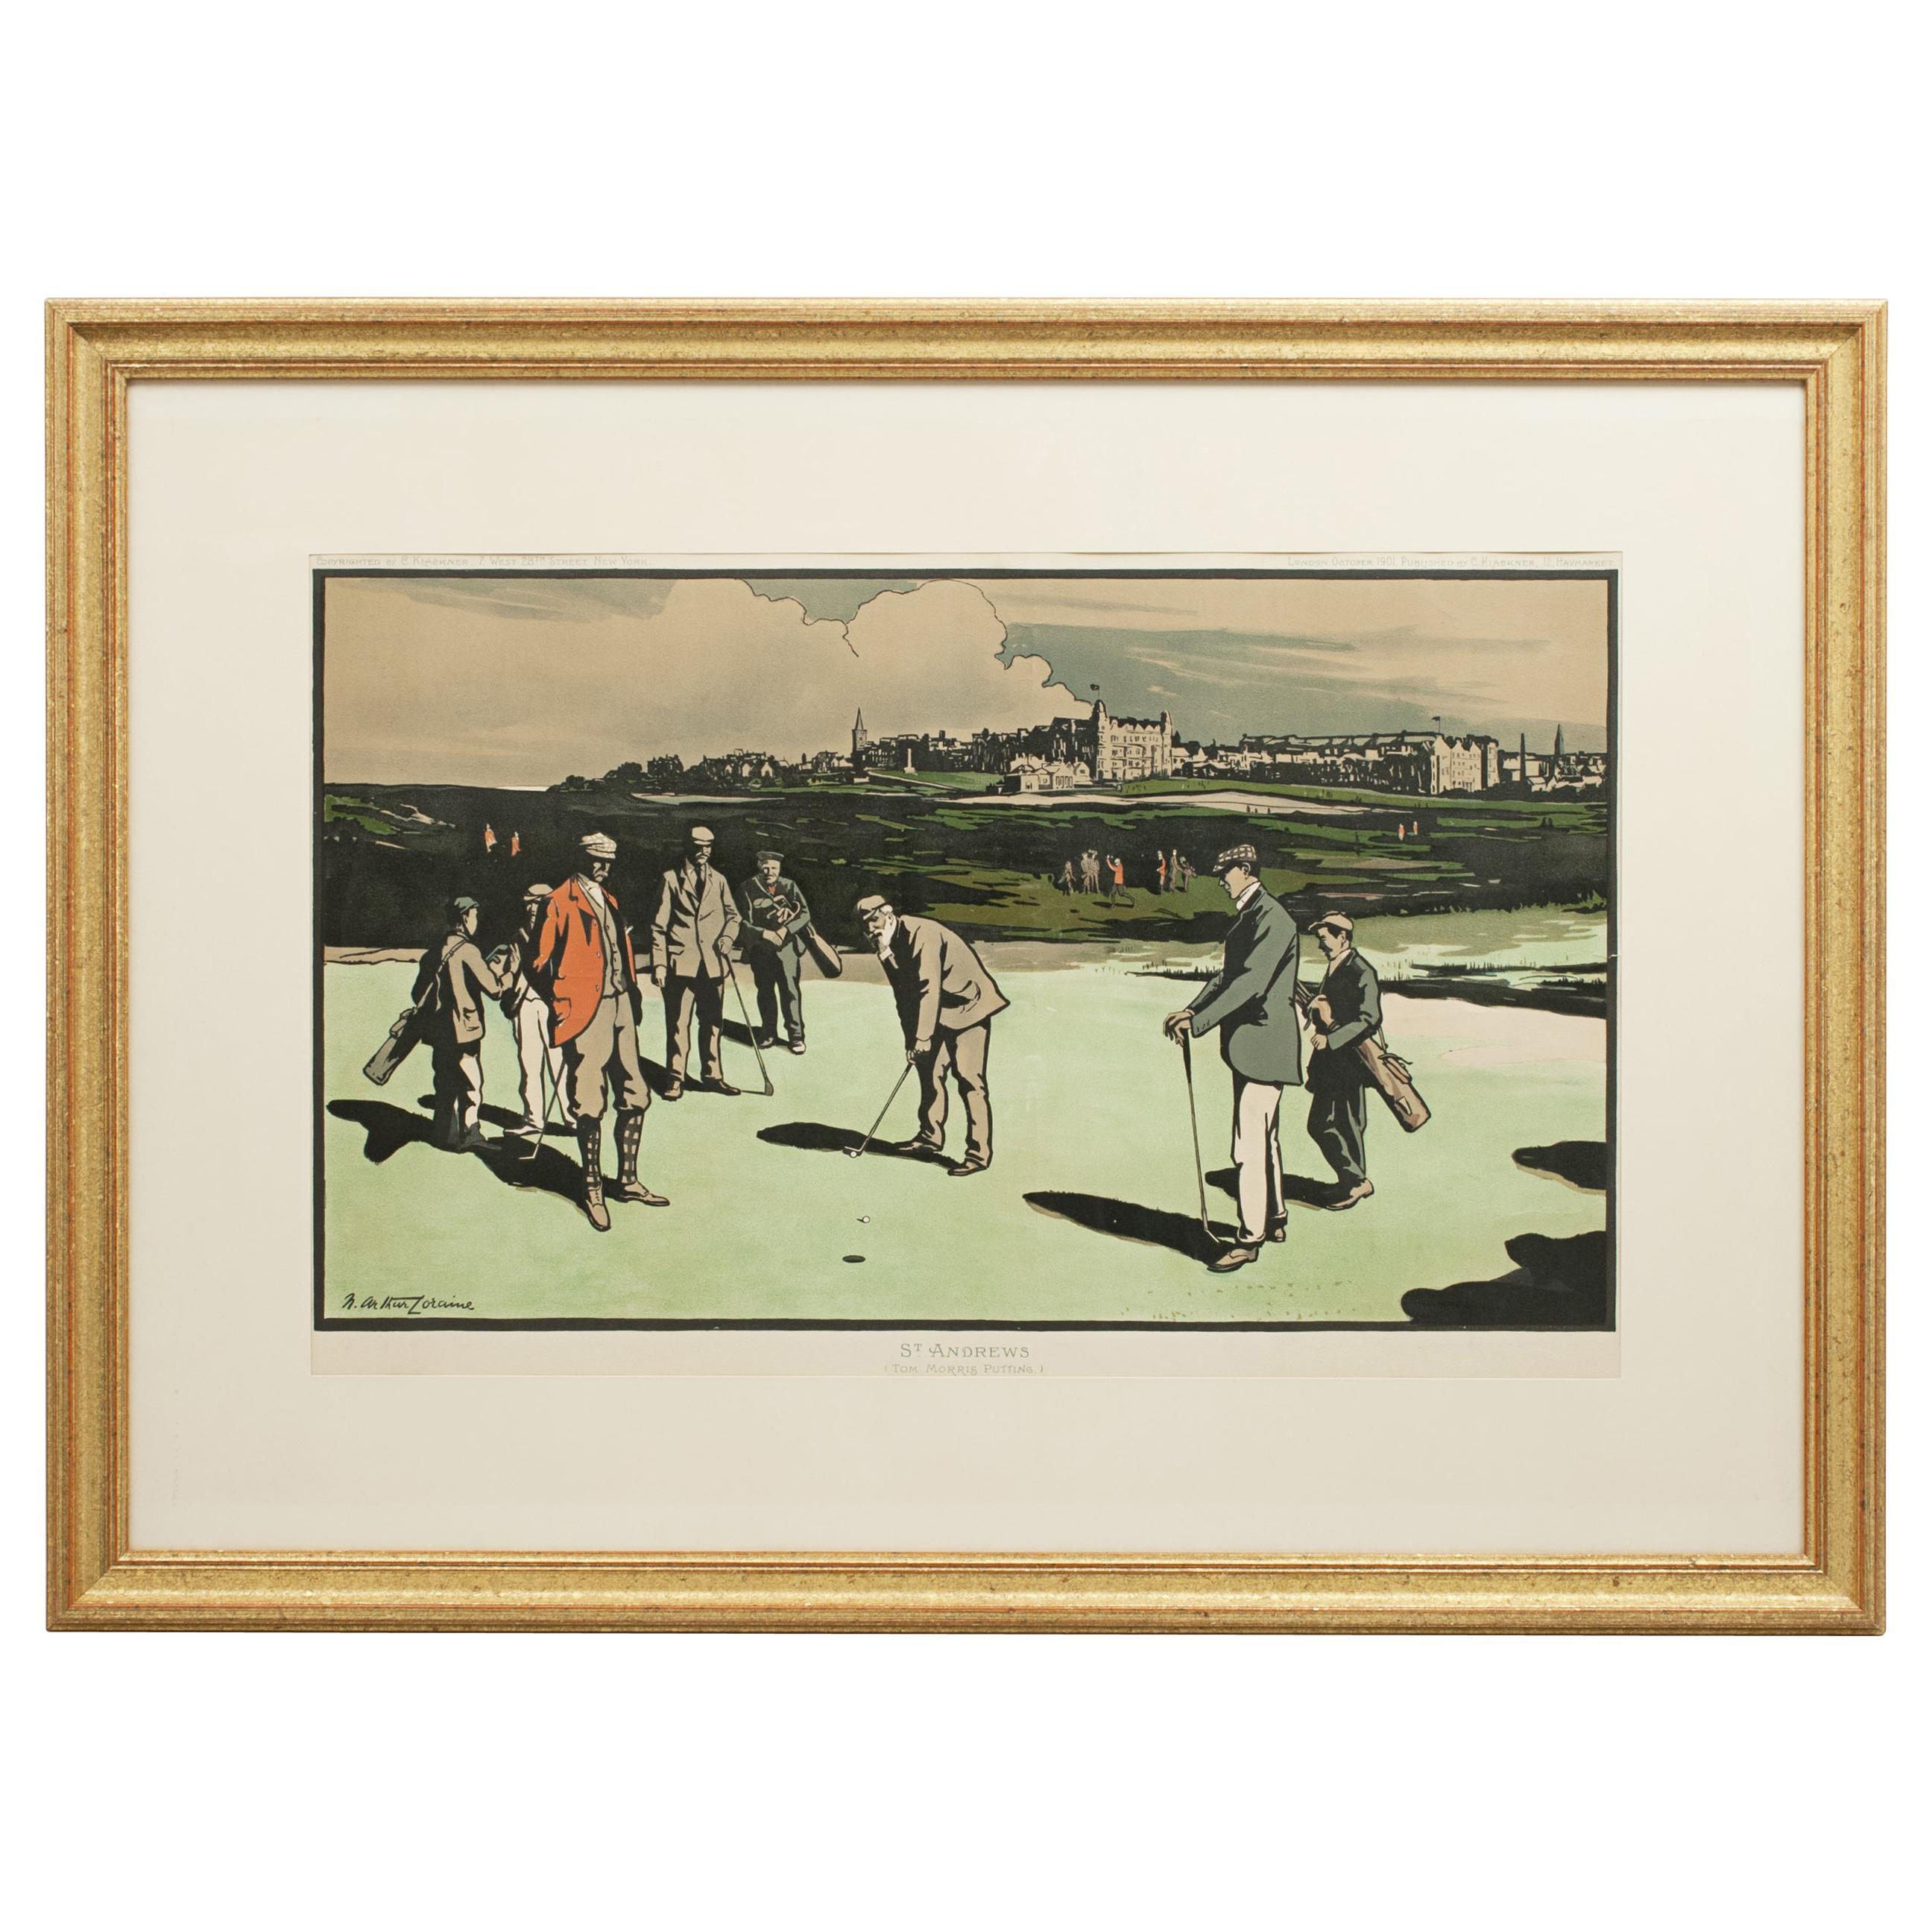 Antique Golf Print, St Andrews after Arthur Loraine